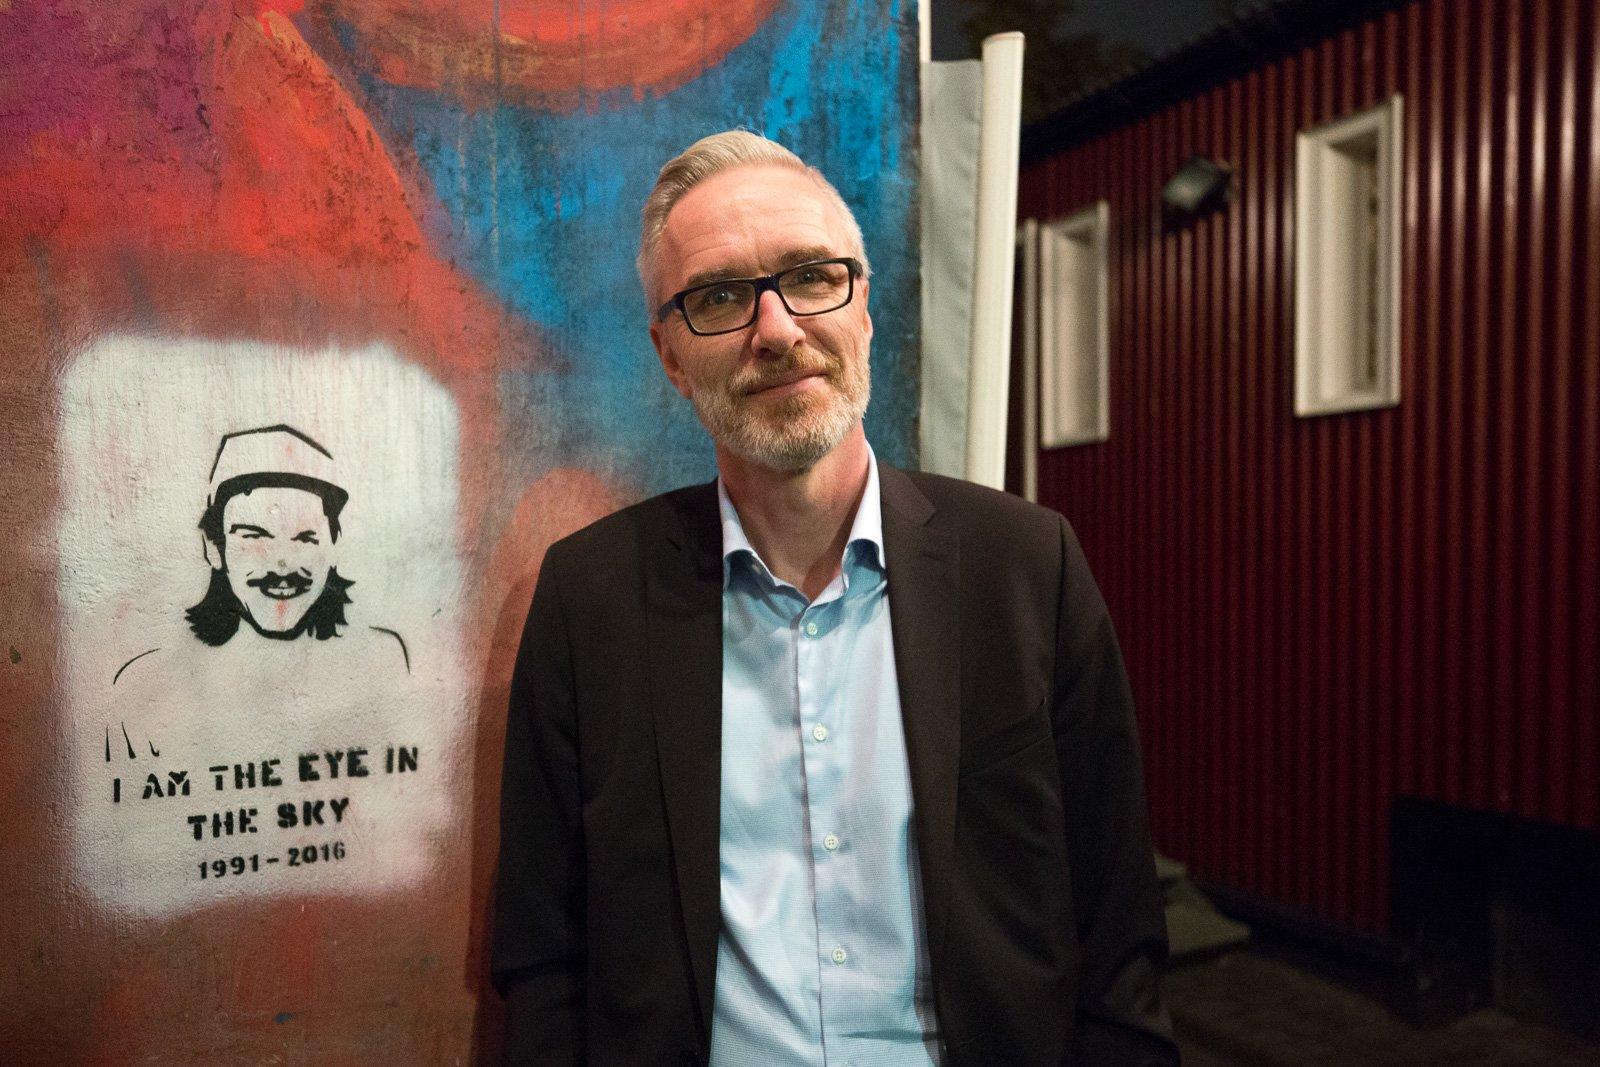 Doorman In Memoriam: Jónas Helgason Talks Youth Suicide Awareness